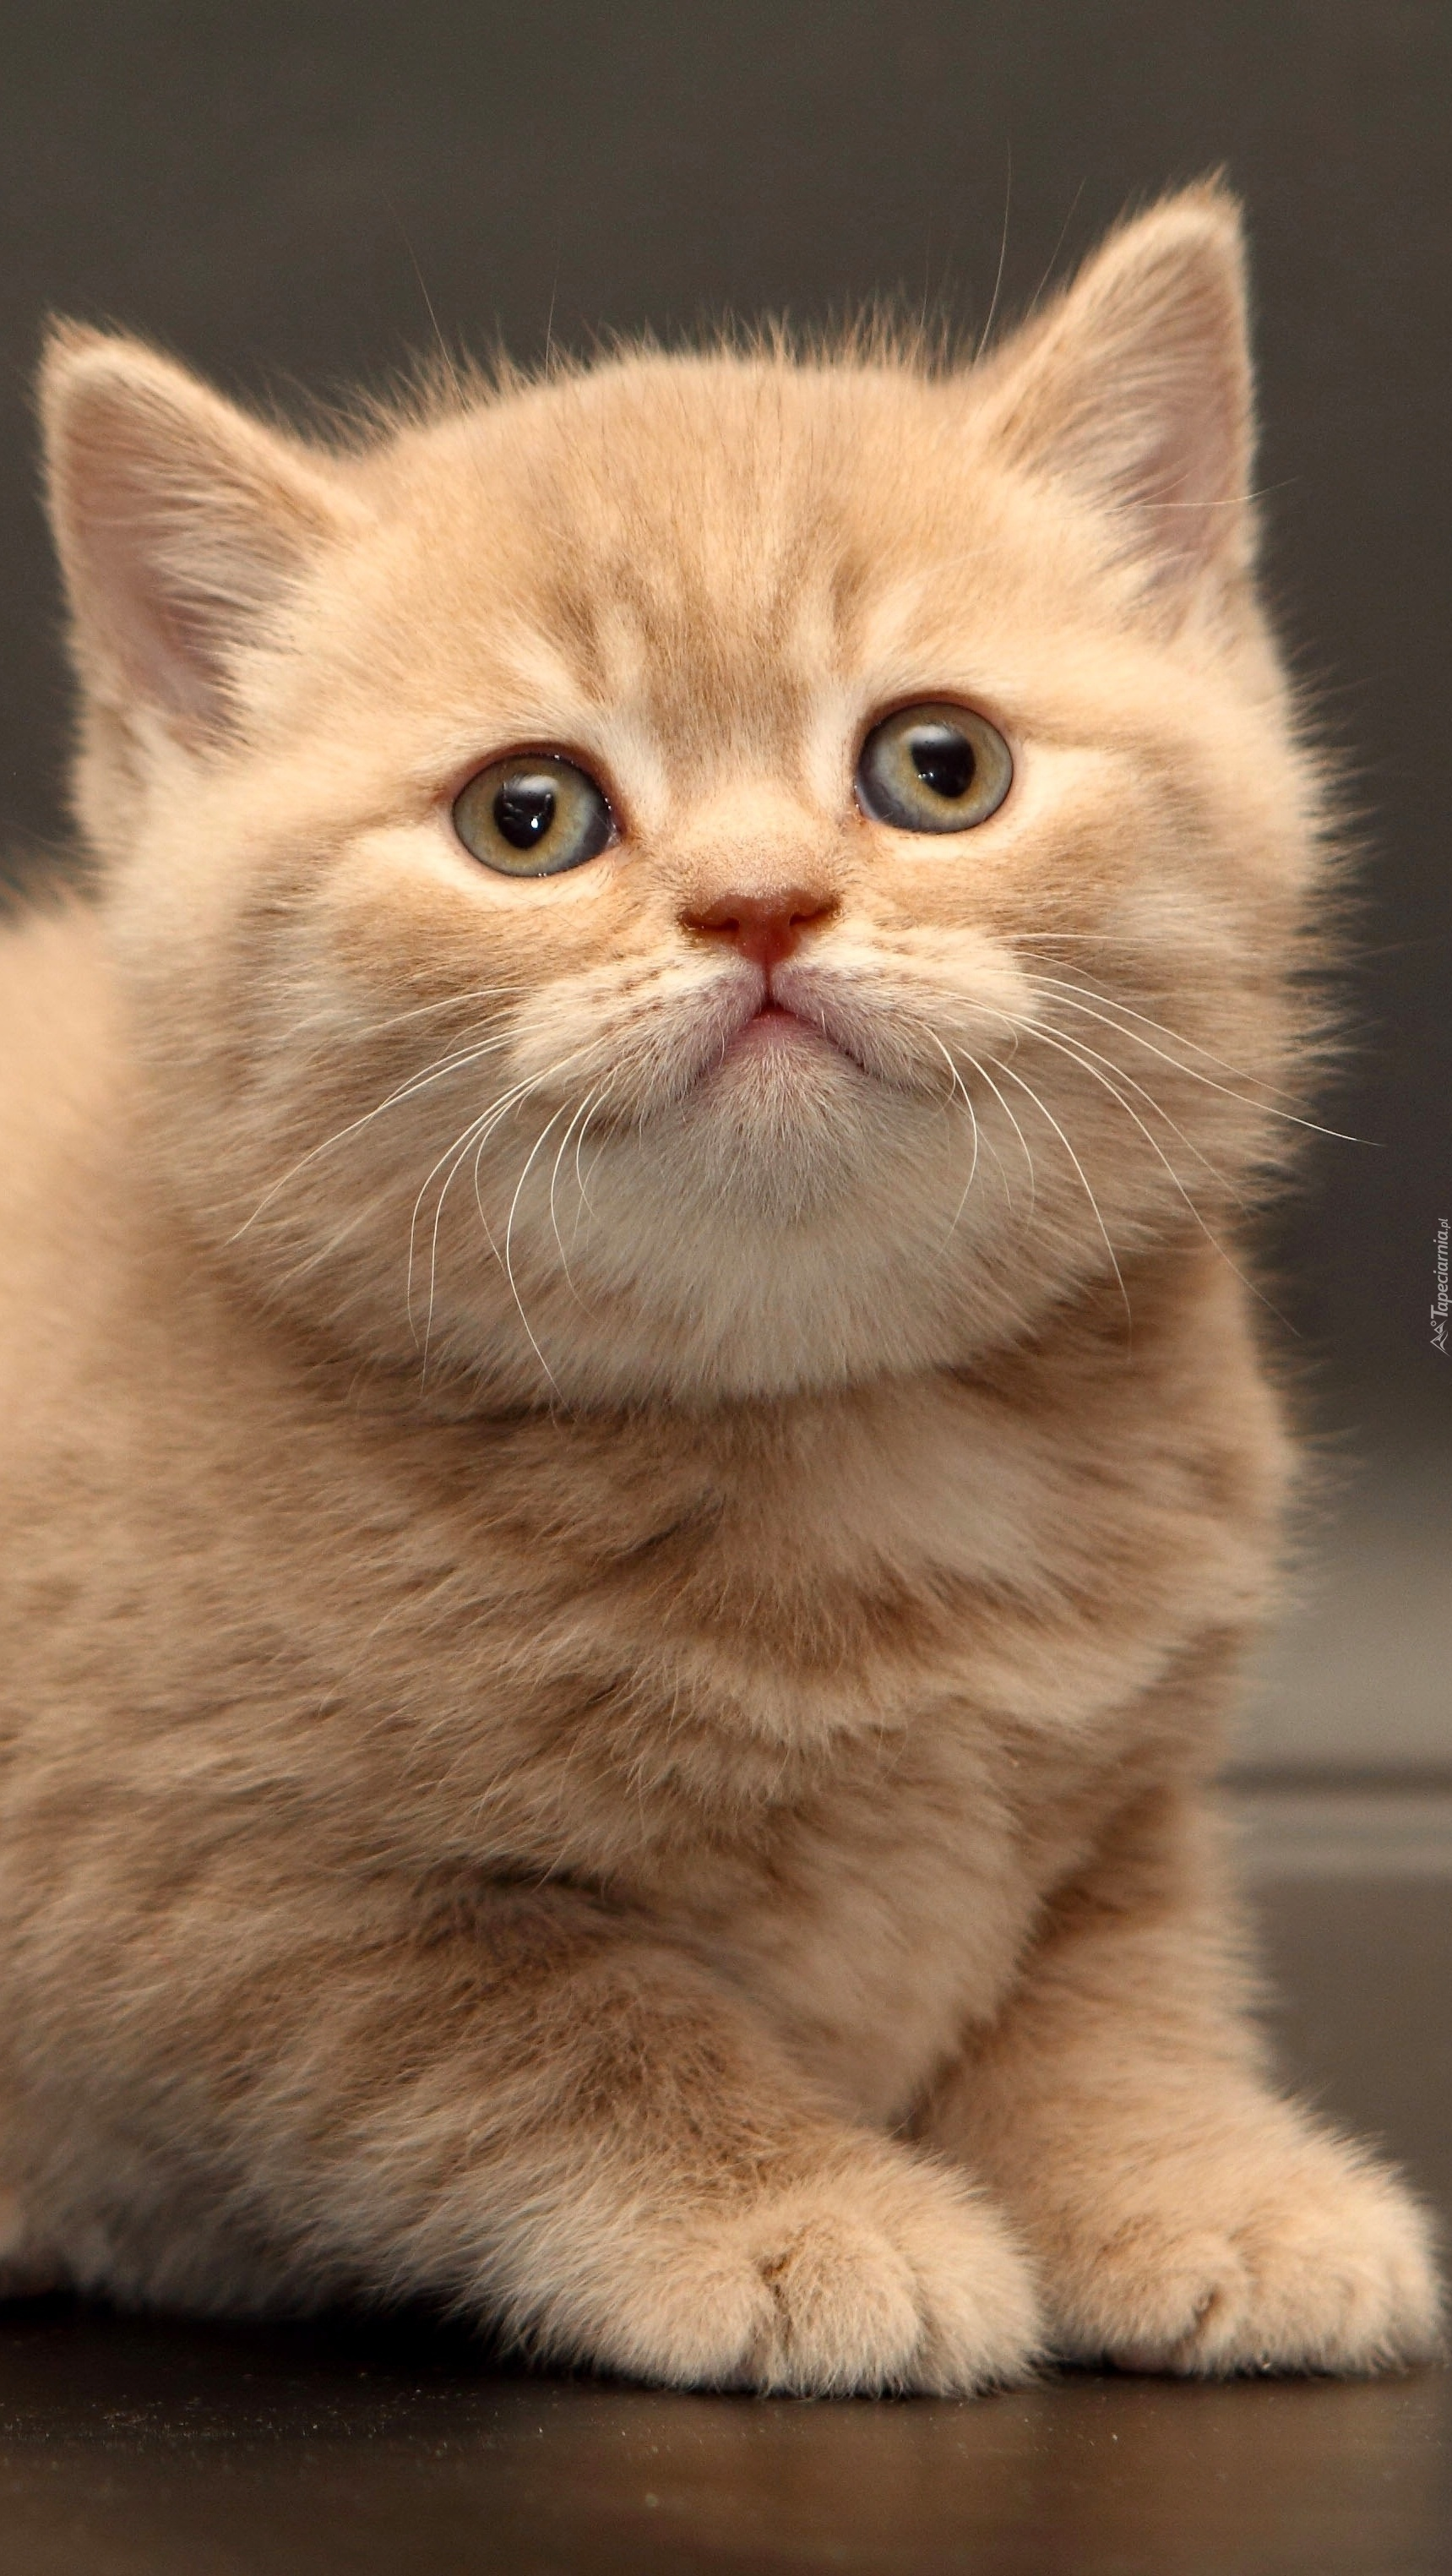 Sympatyczna kocia ruda mordka